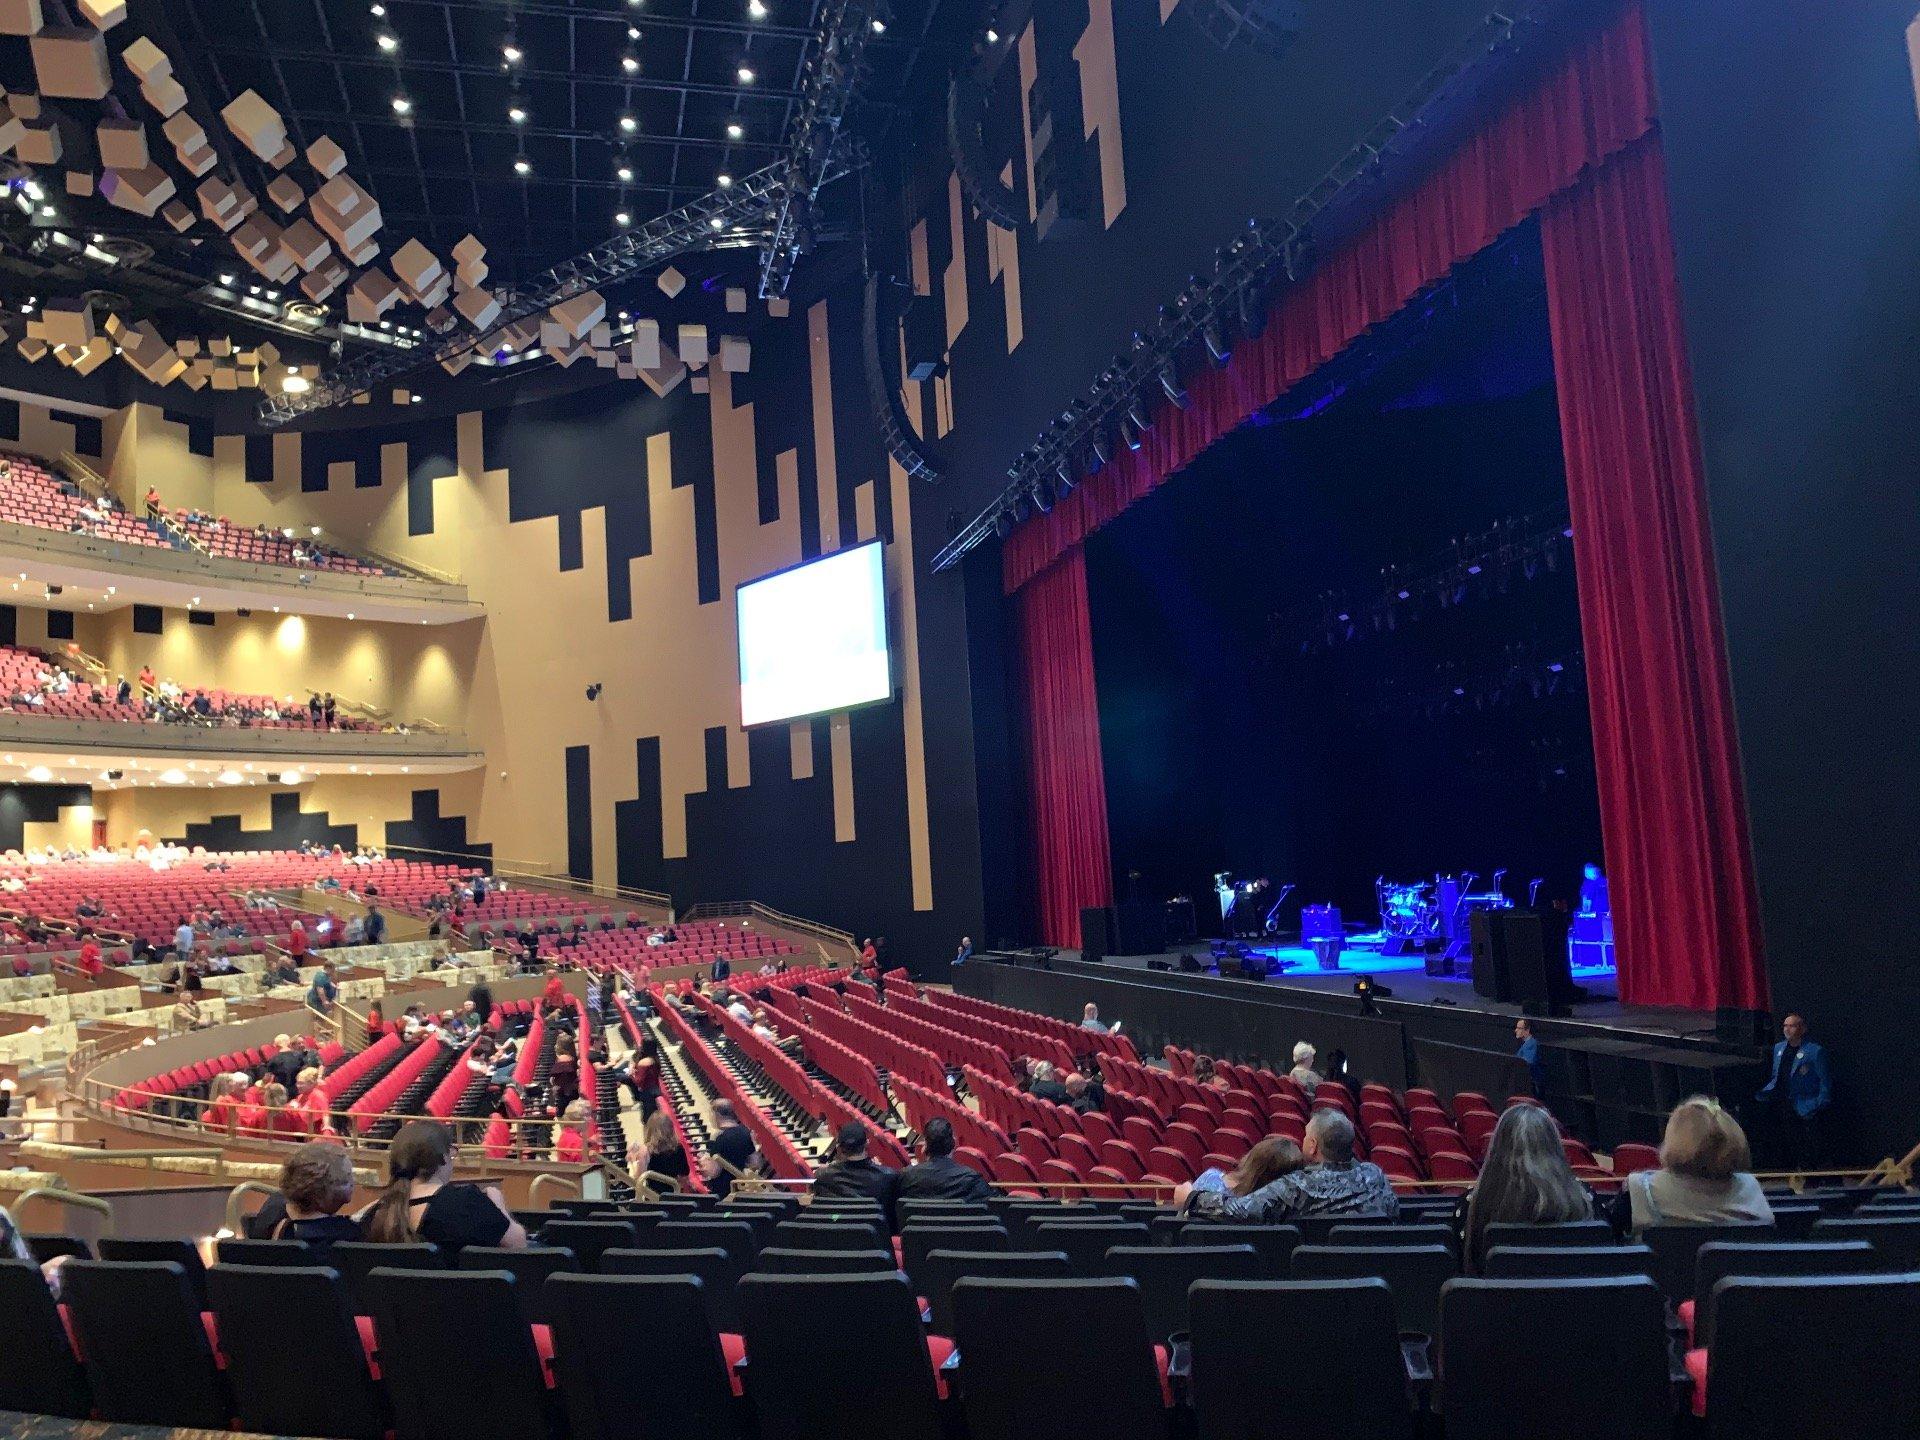 Hard Rock Live At Seminole Hard Rock Section 113 Row A Seat 3